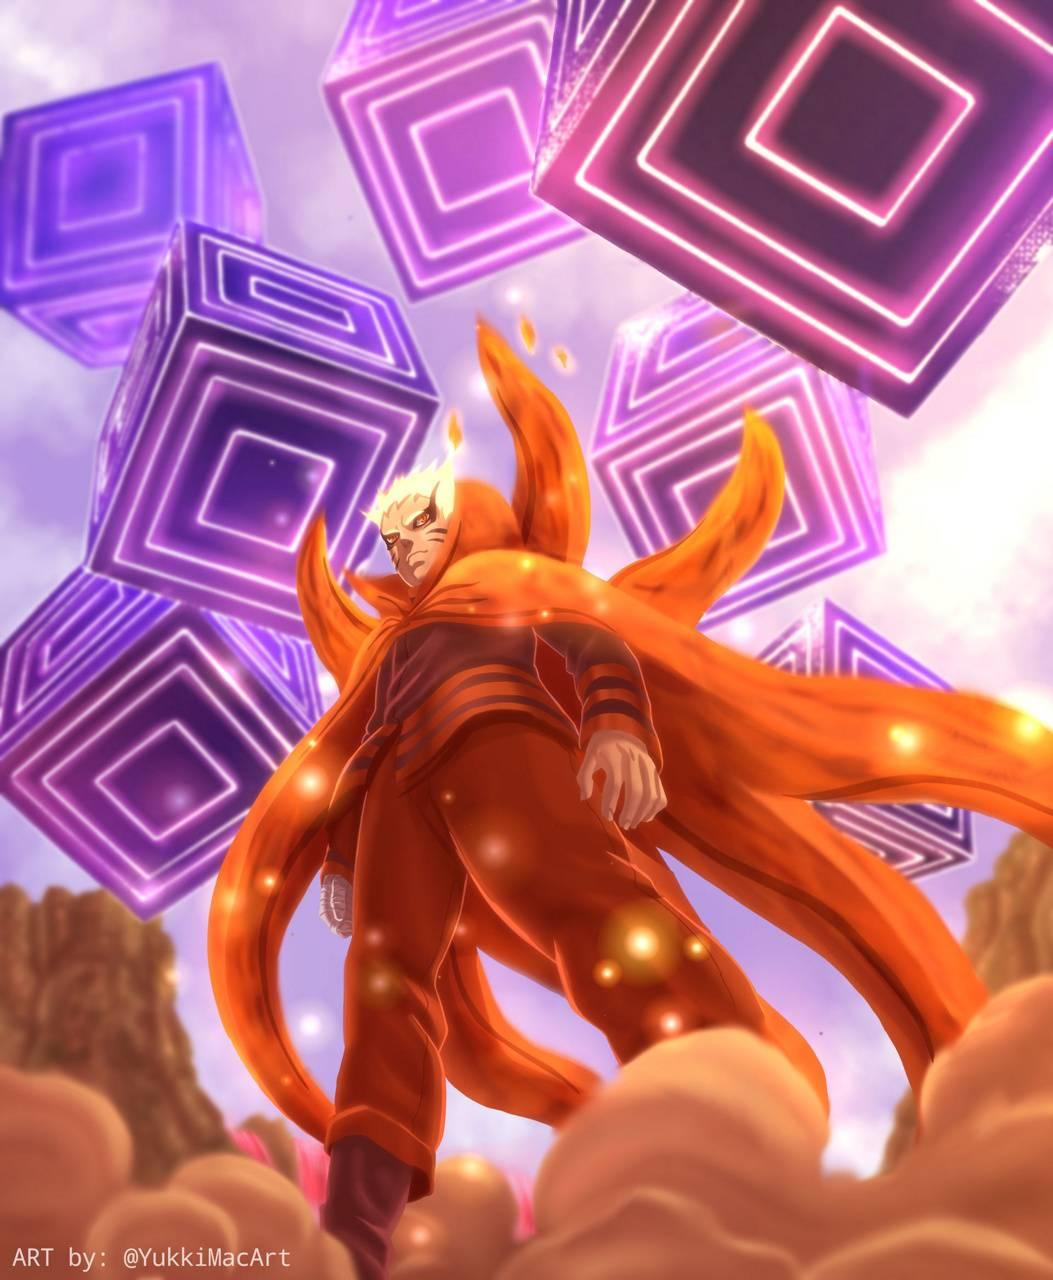 Naruto Baryon Mode Wallpaper By Rakariftiansyah De Free On Zedge